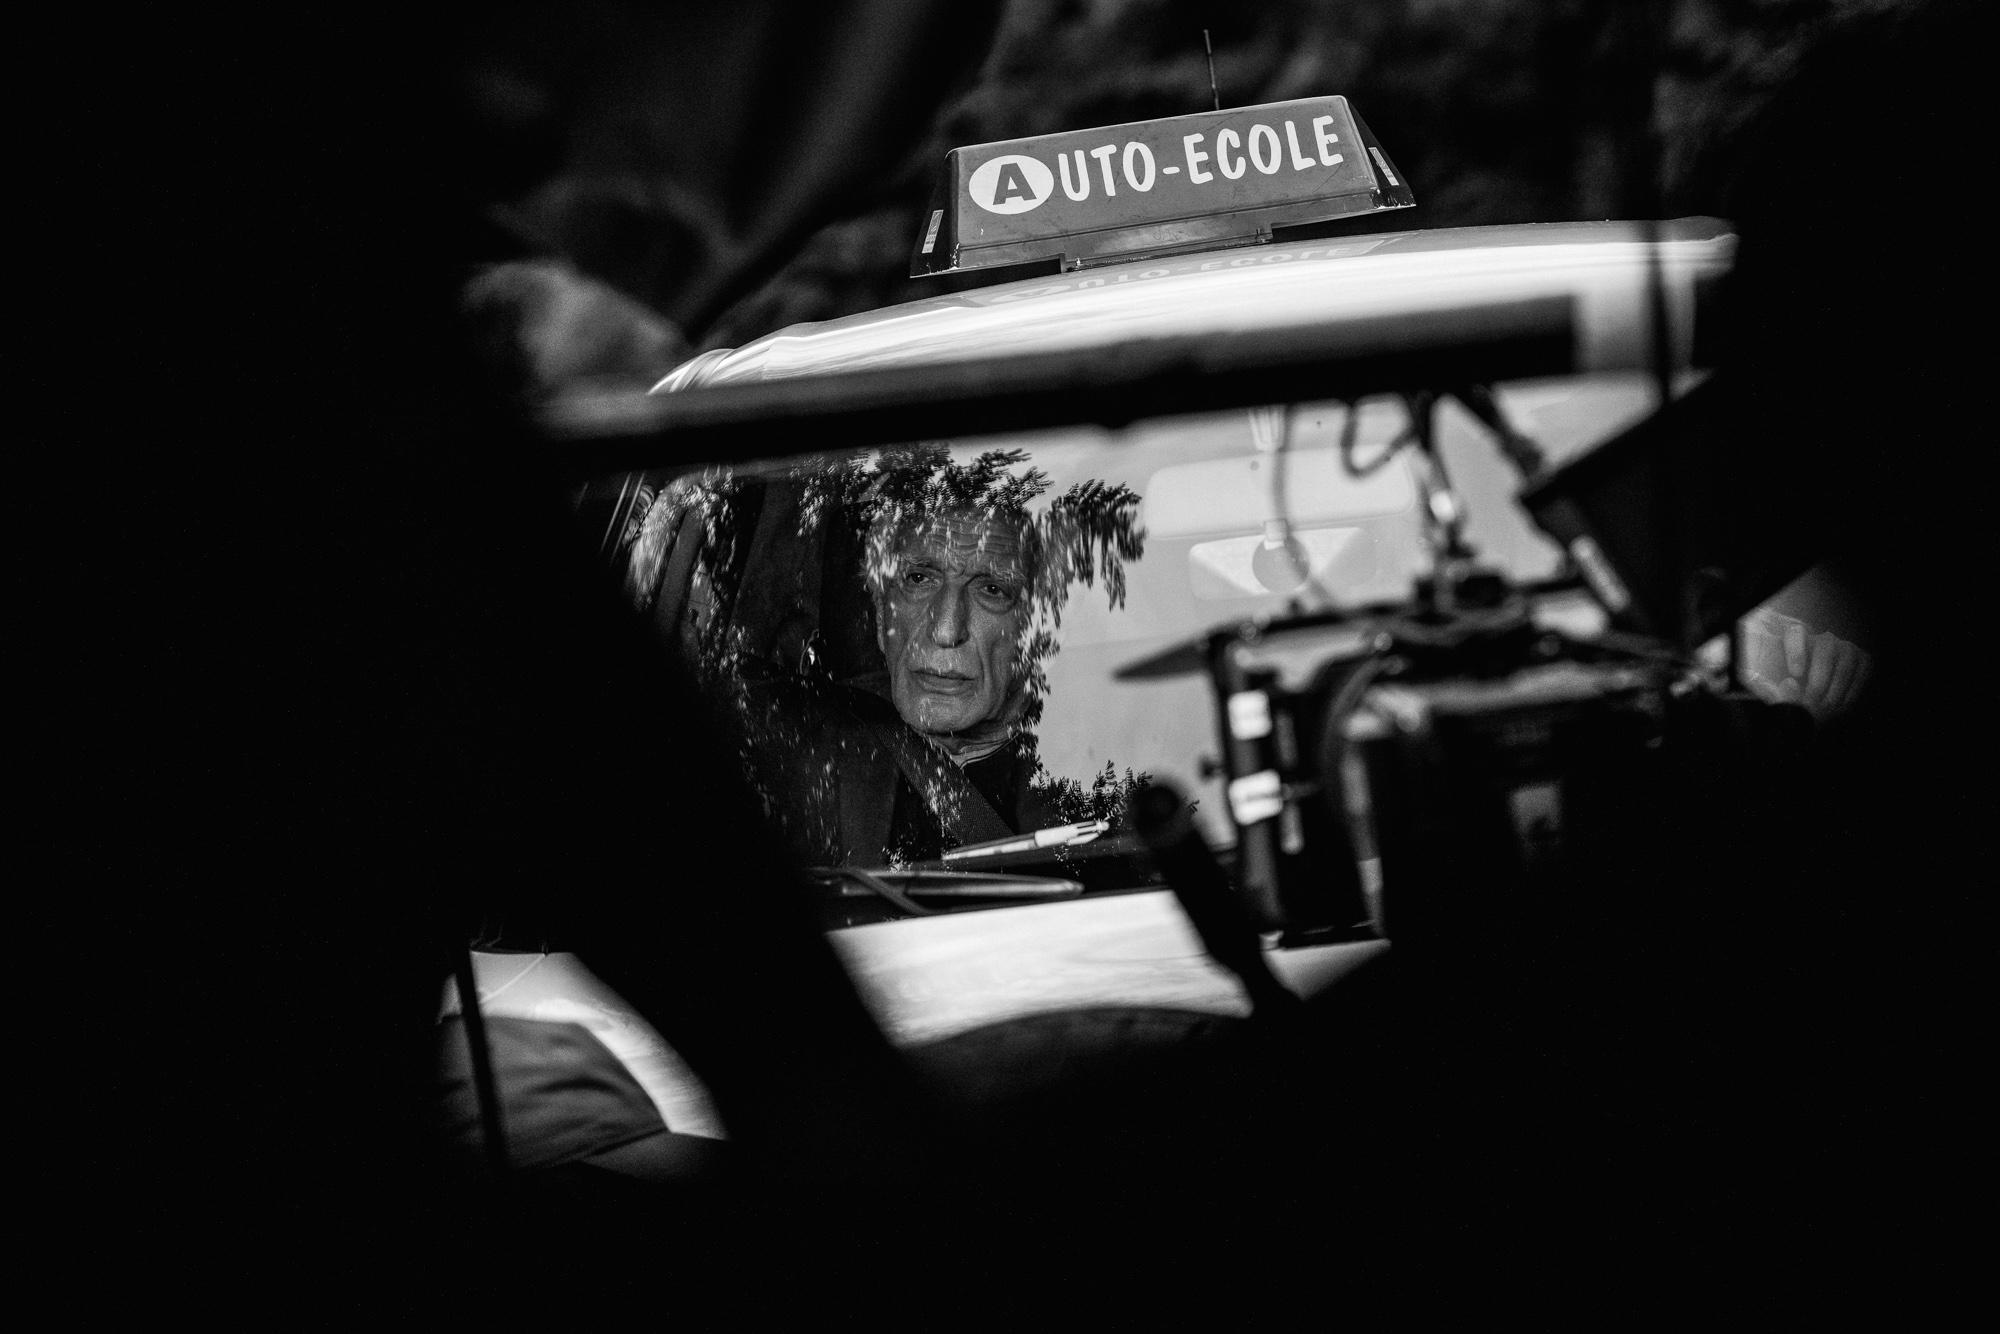 PHOTOGRAPHE PLATEAU – DERNIERE LIGNE DROITE – GERARD DARMON – CAROLINE ANGLADE – HELOISE MARTIN – LYON PARIS FRANCE-12